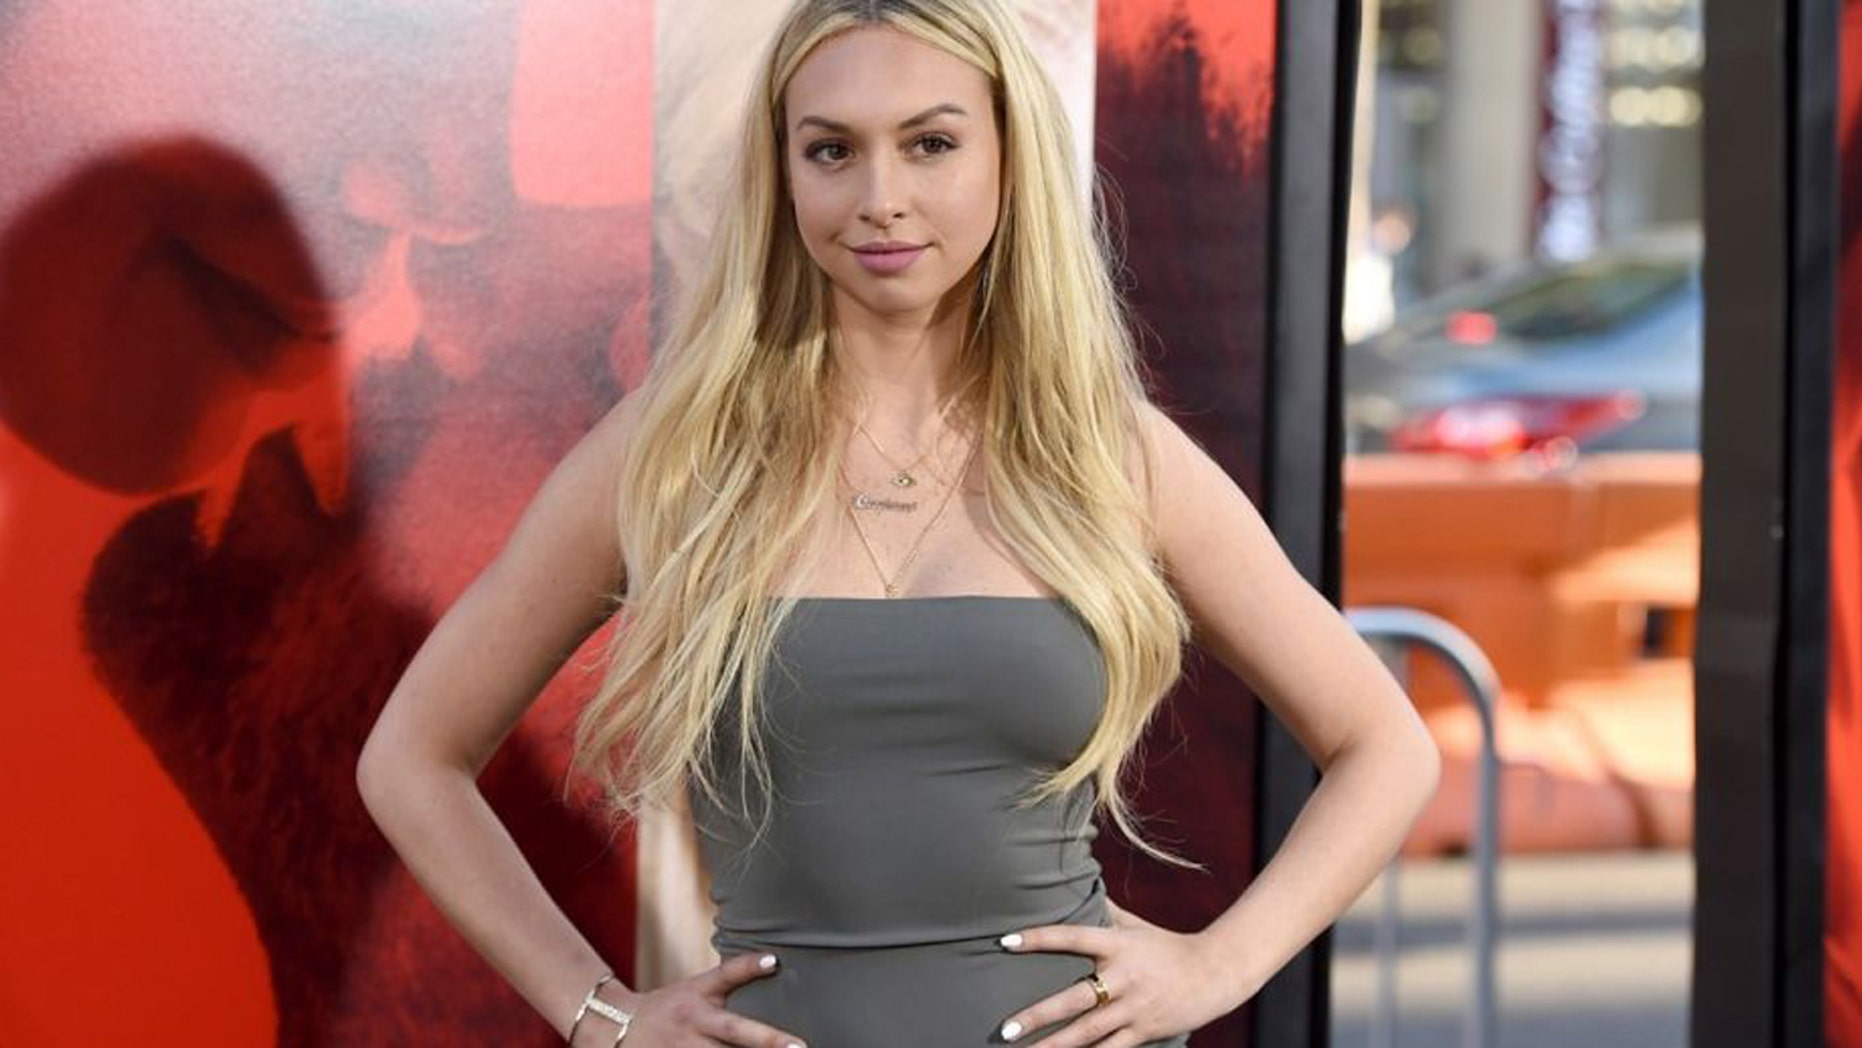 Former 'Bachelor' contestant Corrine Olympios denies plastic surgery rumors.